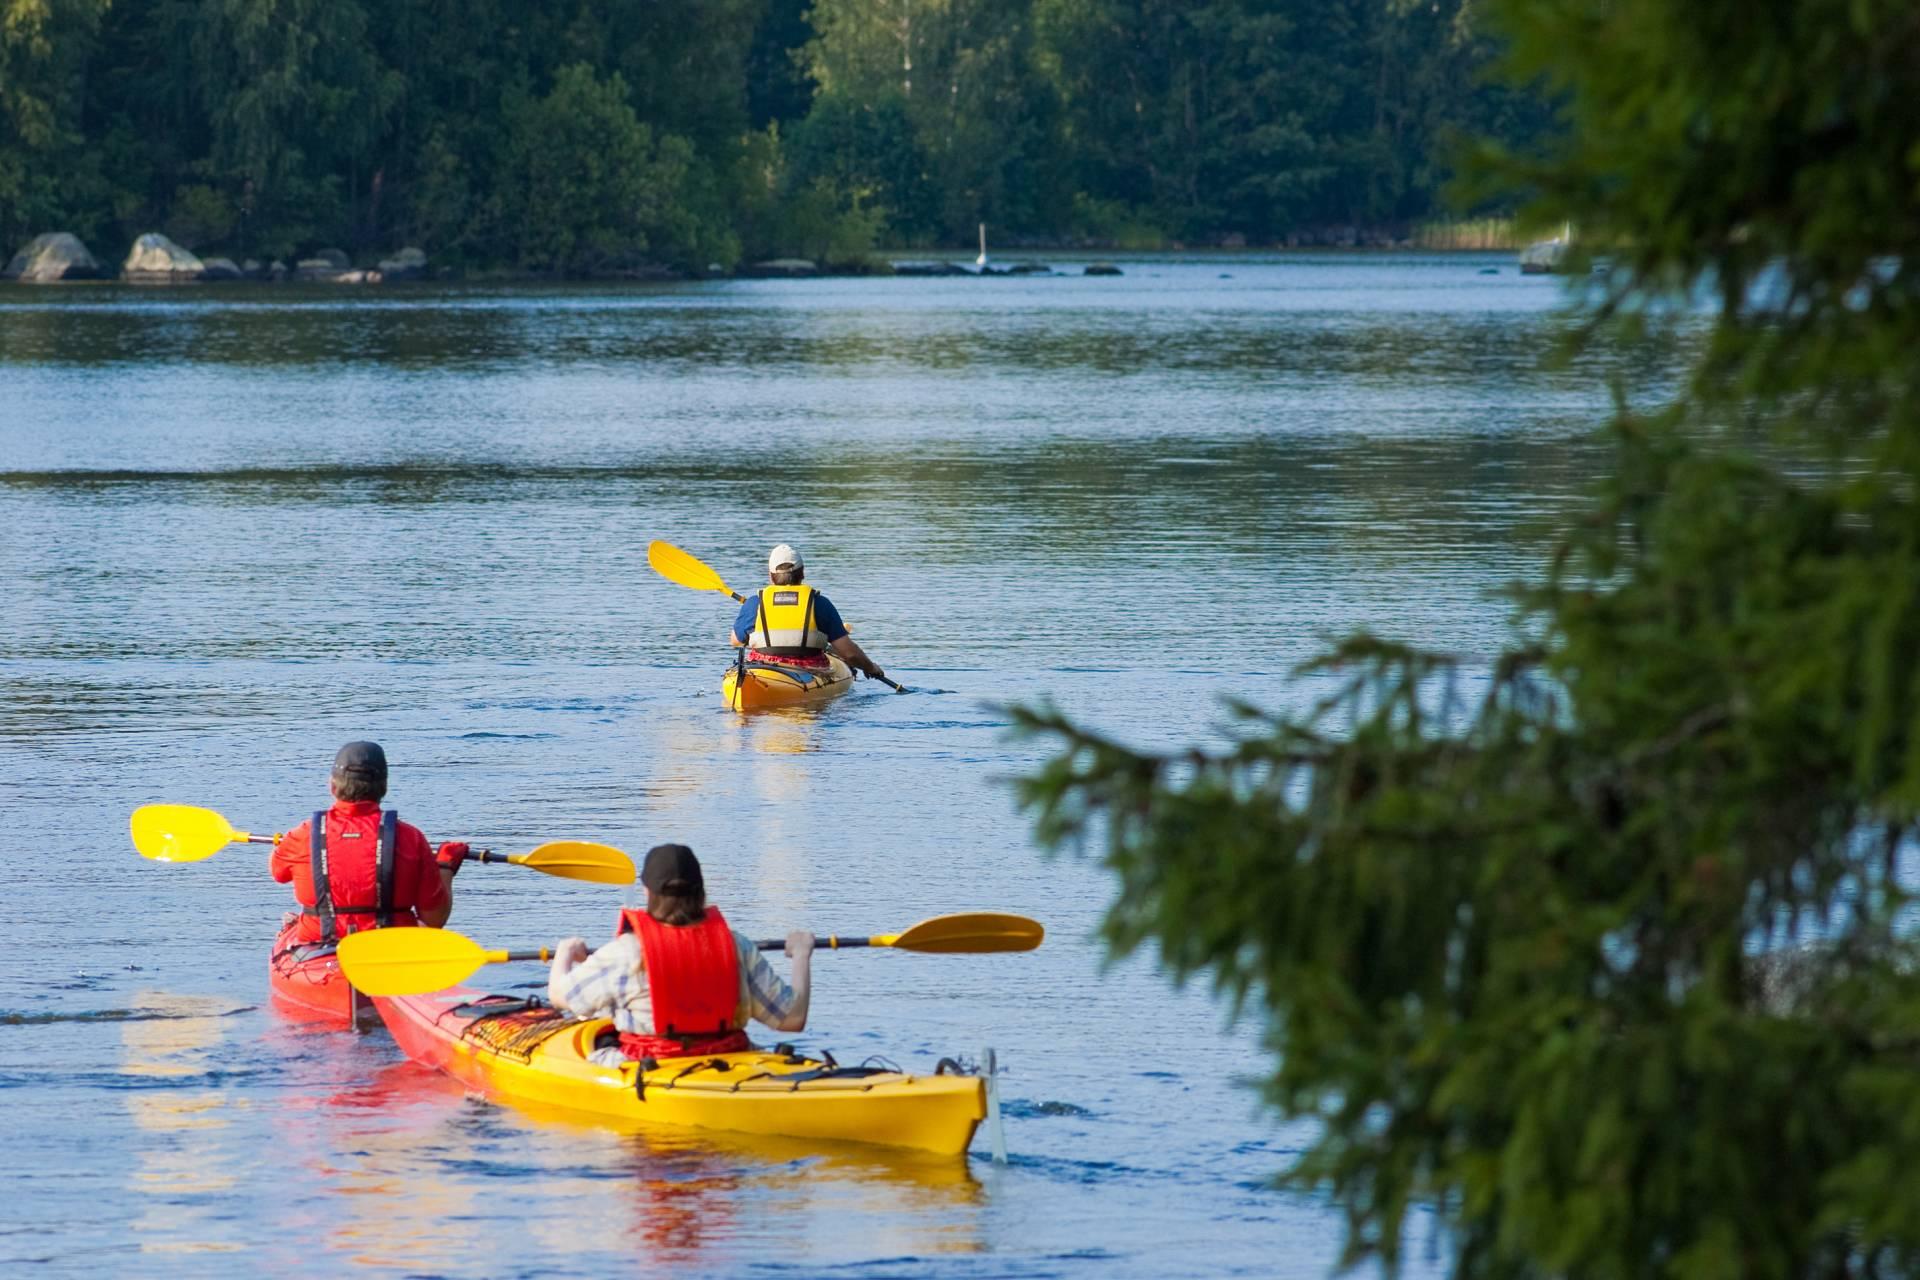 Three man are paddling in Valkeakoski